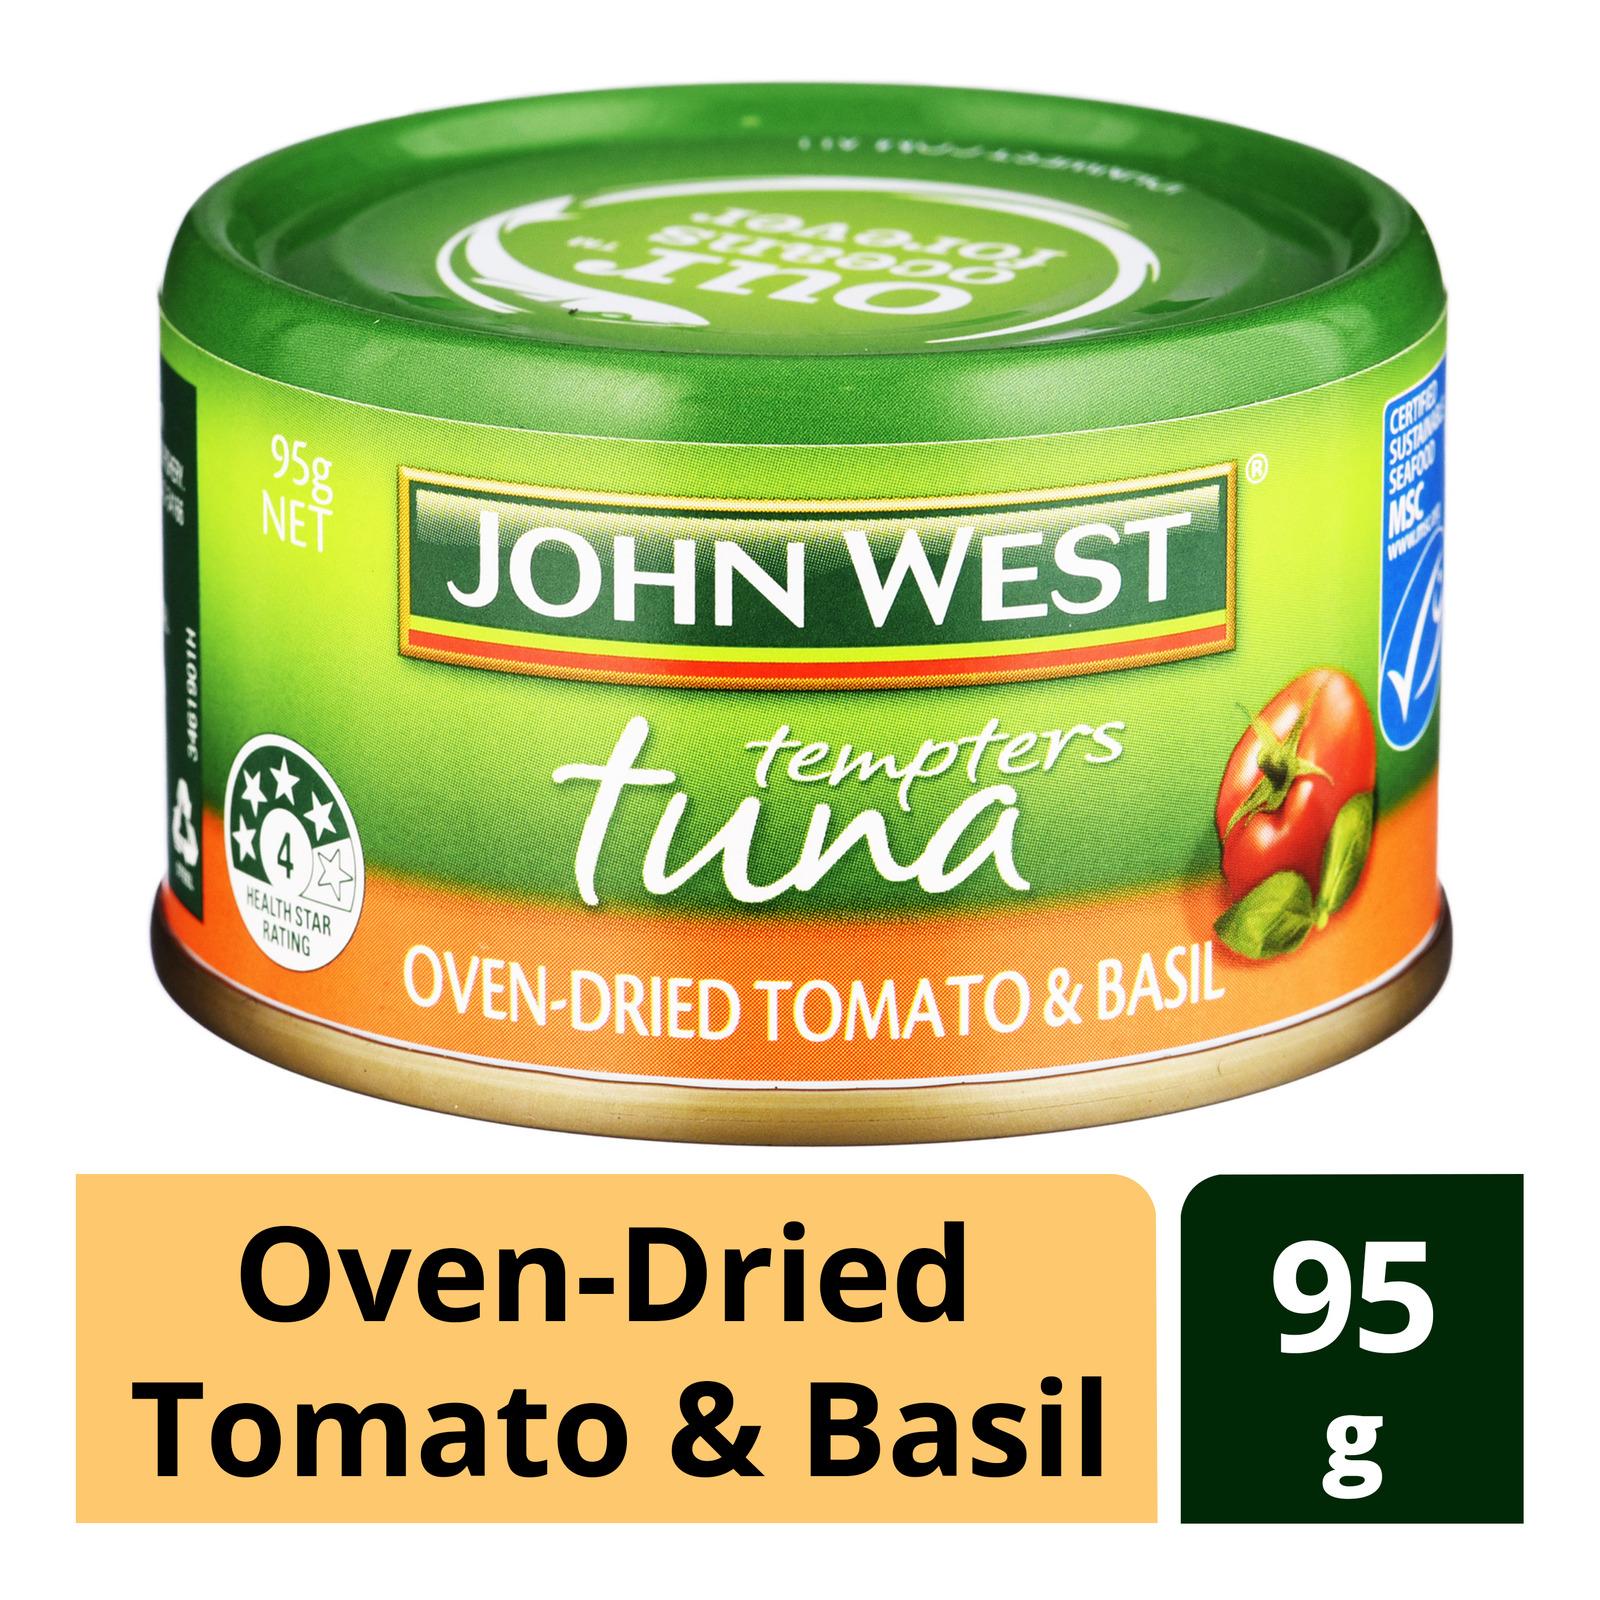 John West Tempters Tuna - Oven-Dried Tomato & Basil